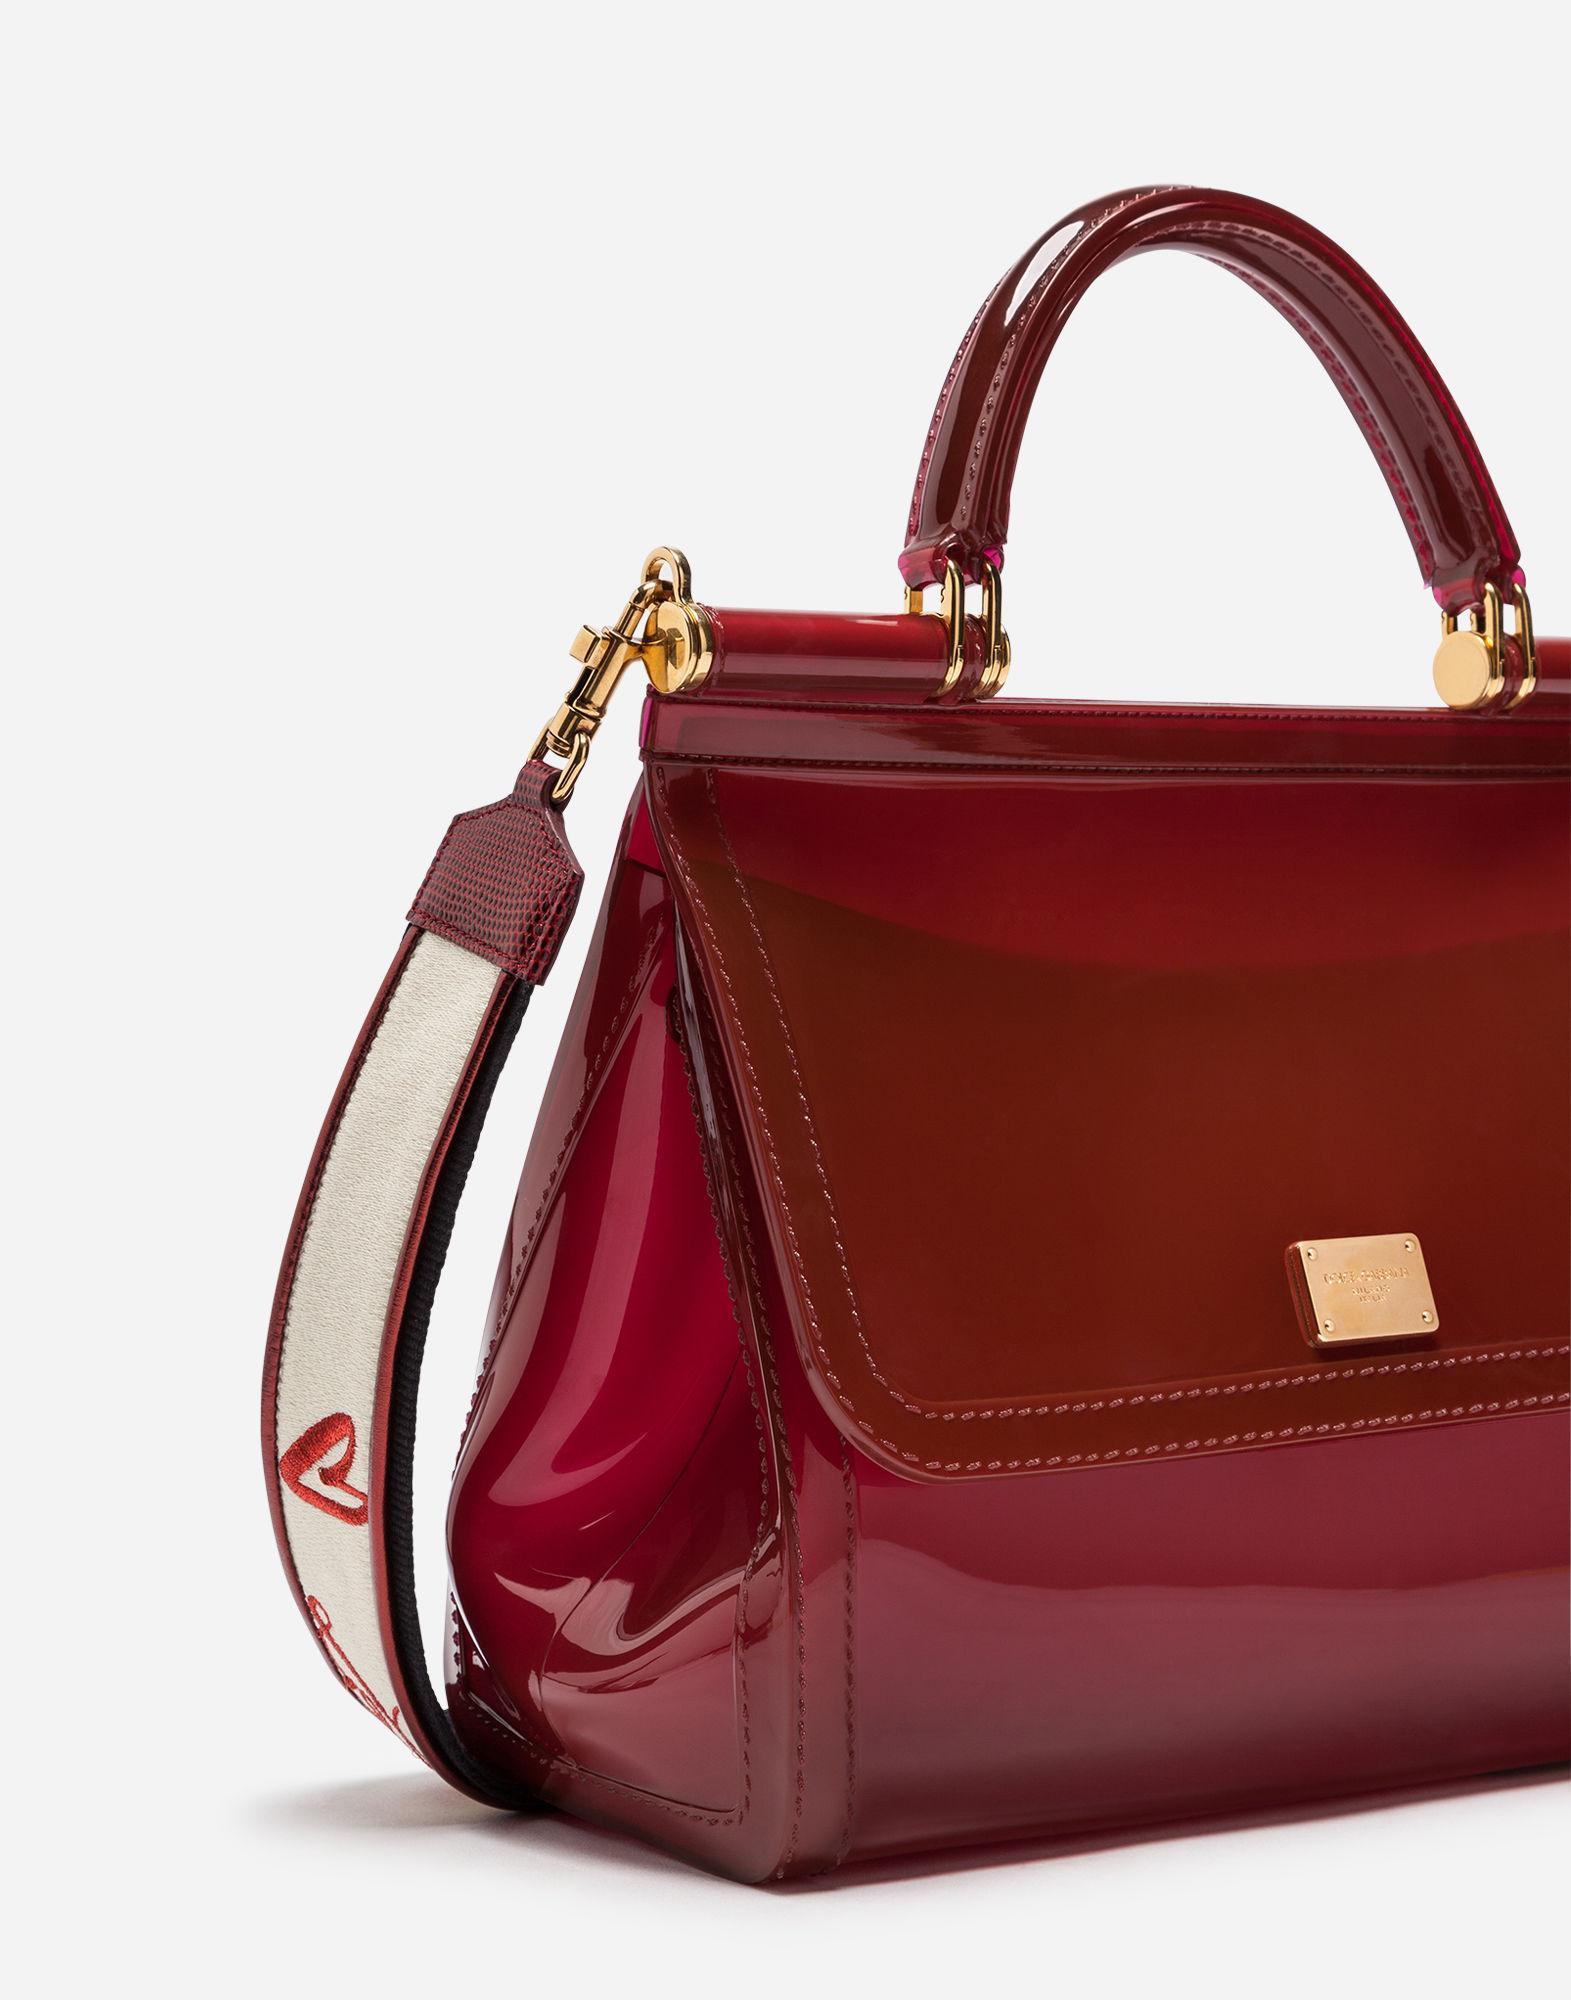 b5e2be4911d1 Lyst - Dolce   Gabbana Semi-transparent Rubber Sicily Handbag in Red